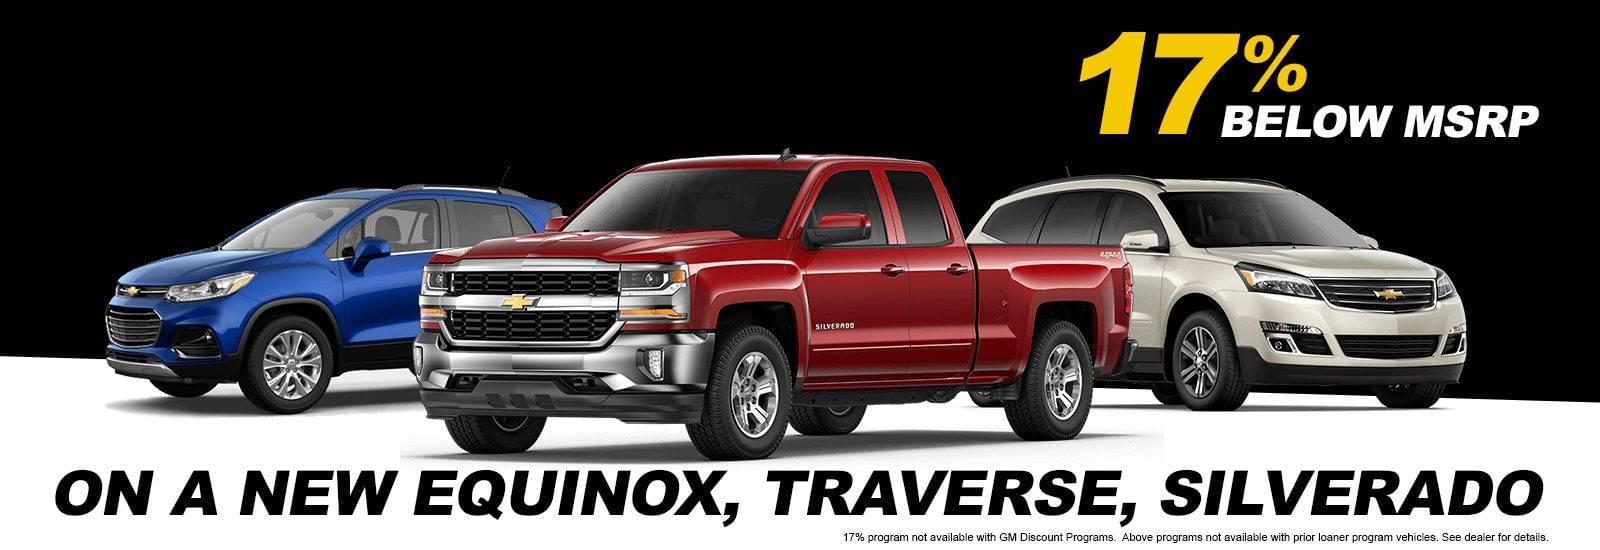 Get 17 Percent off new Equinox, Traverse, Silverado